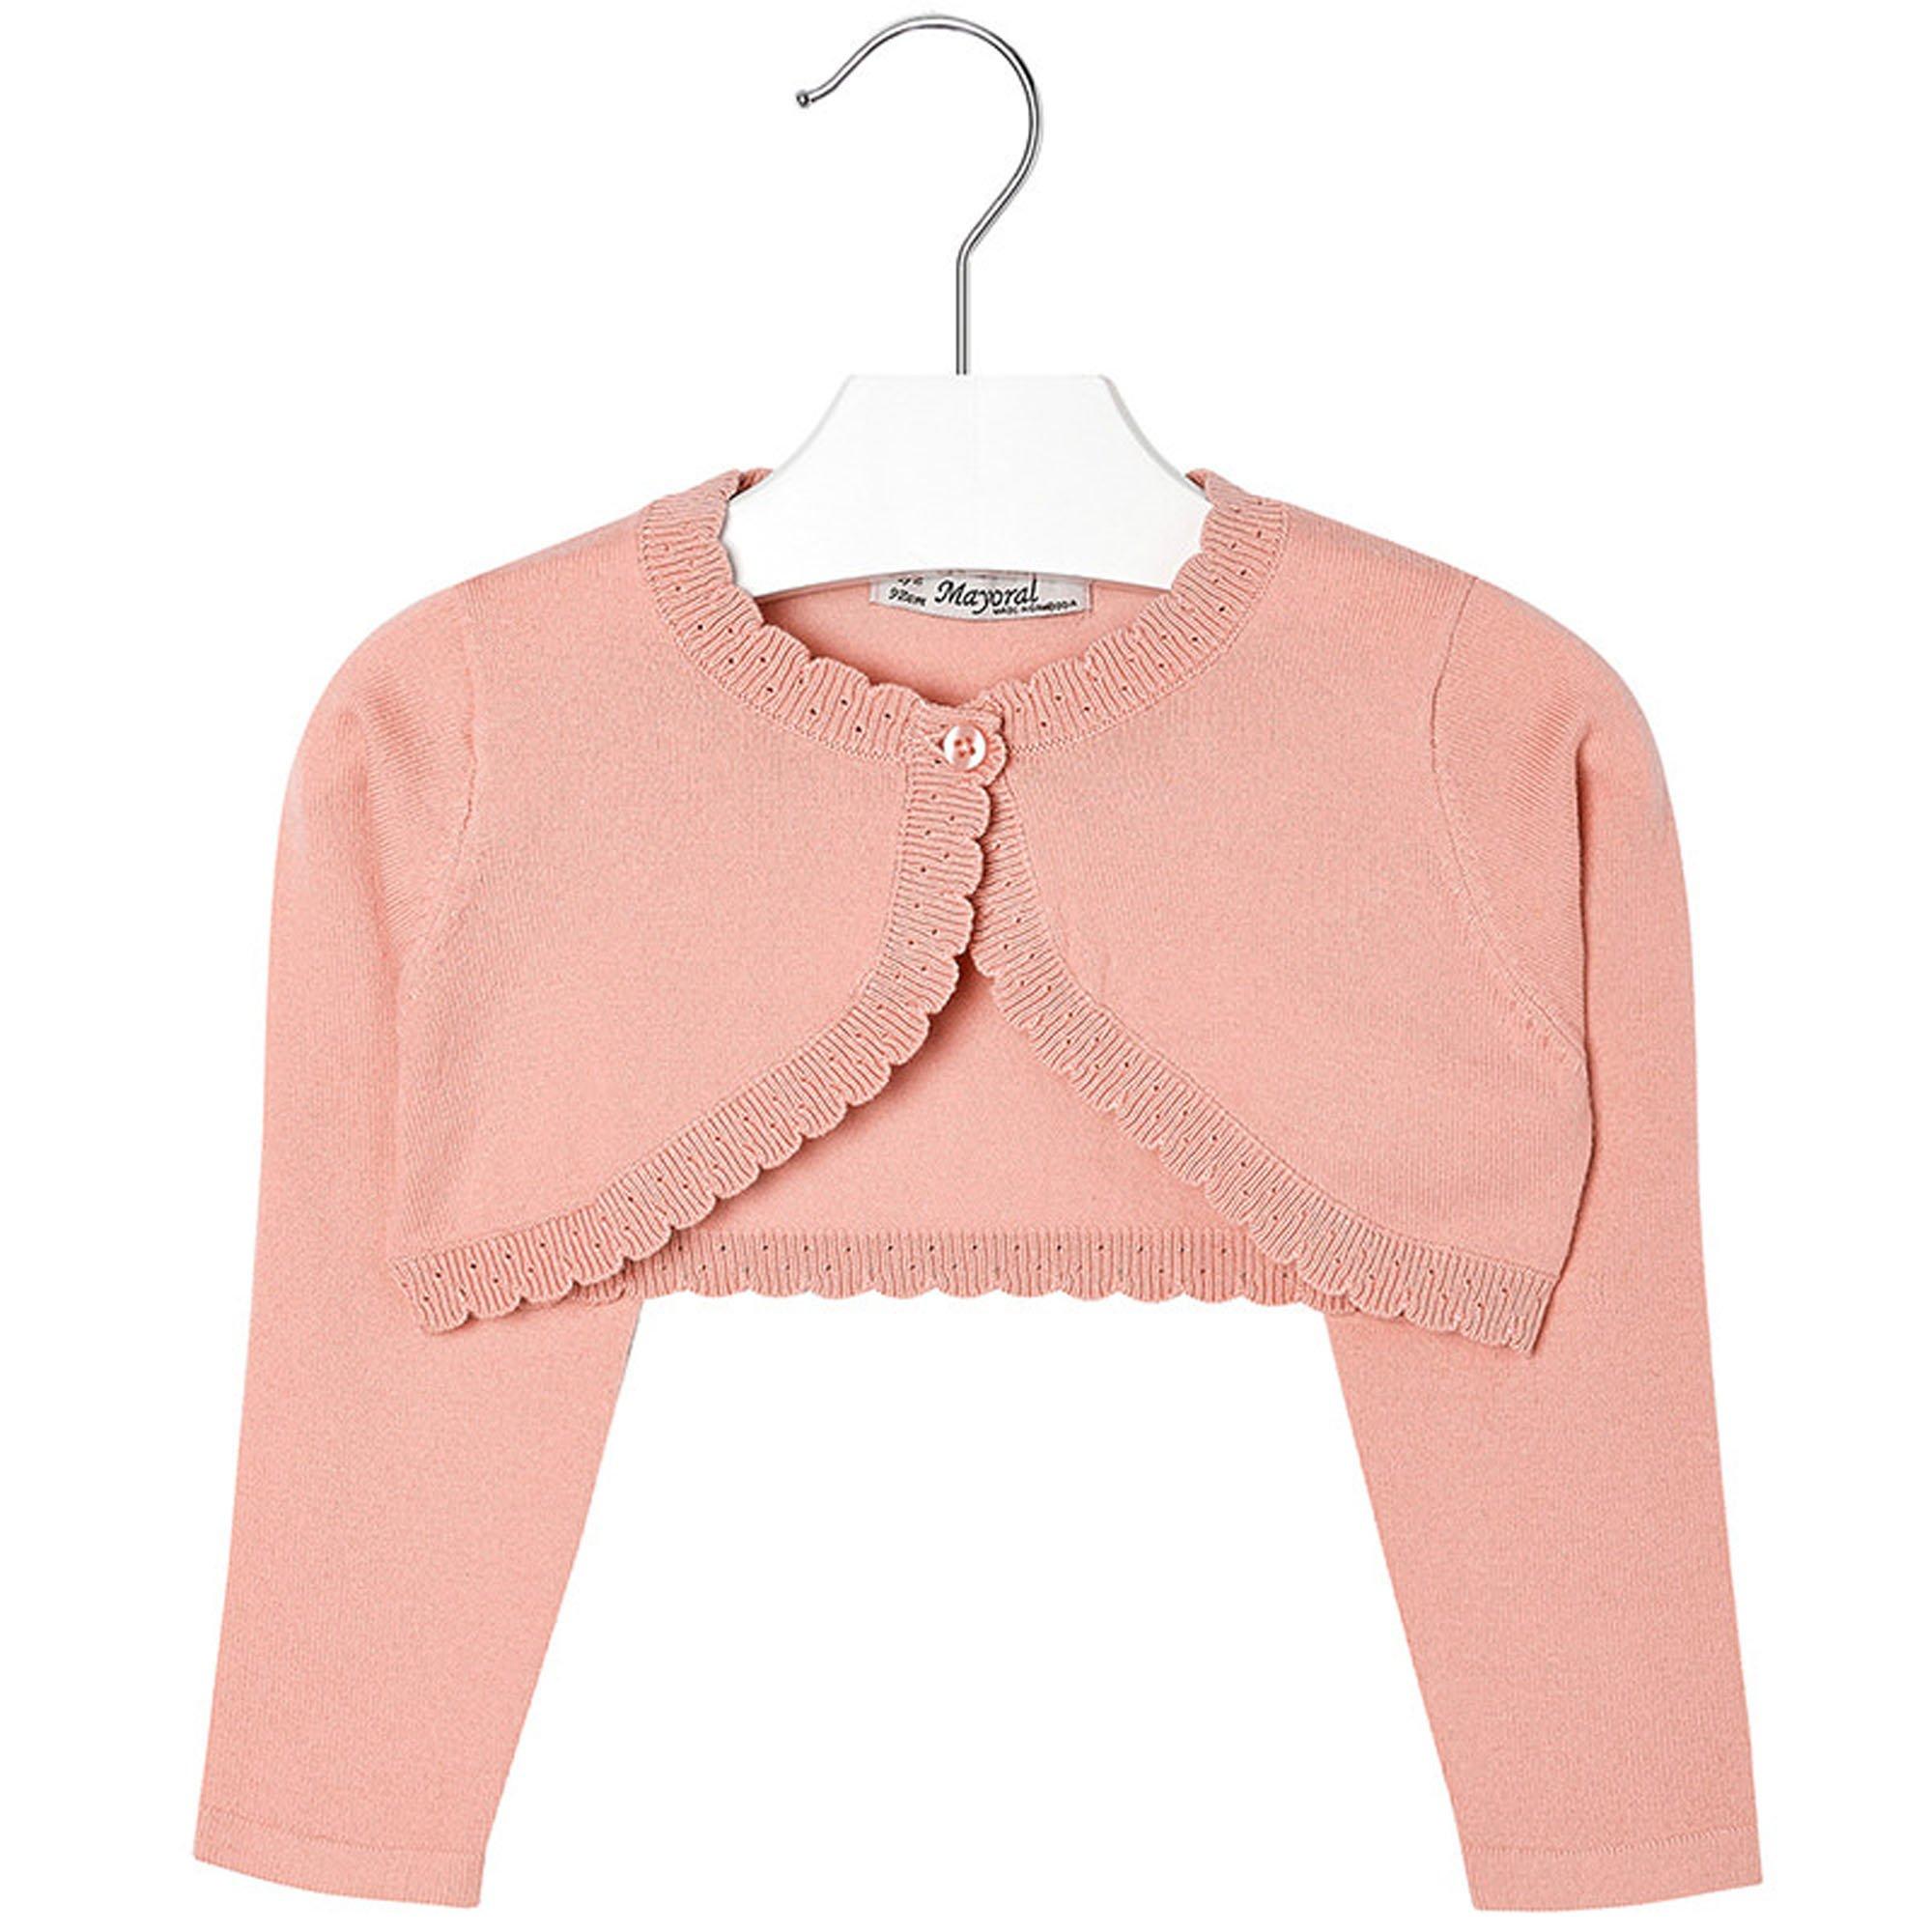 Mayoral Girls 2T-9 Papaya-Orange Scallop Edge Knit Shrug Cardigan Sweater, Papaya,2